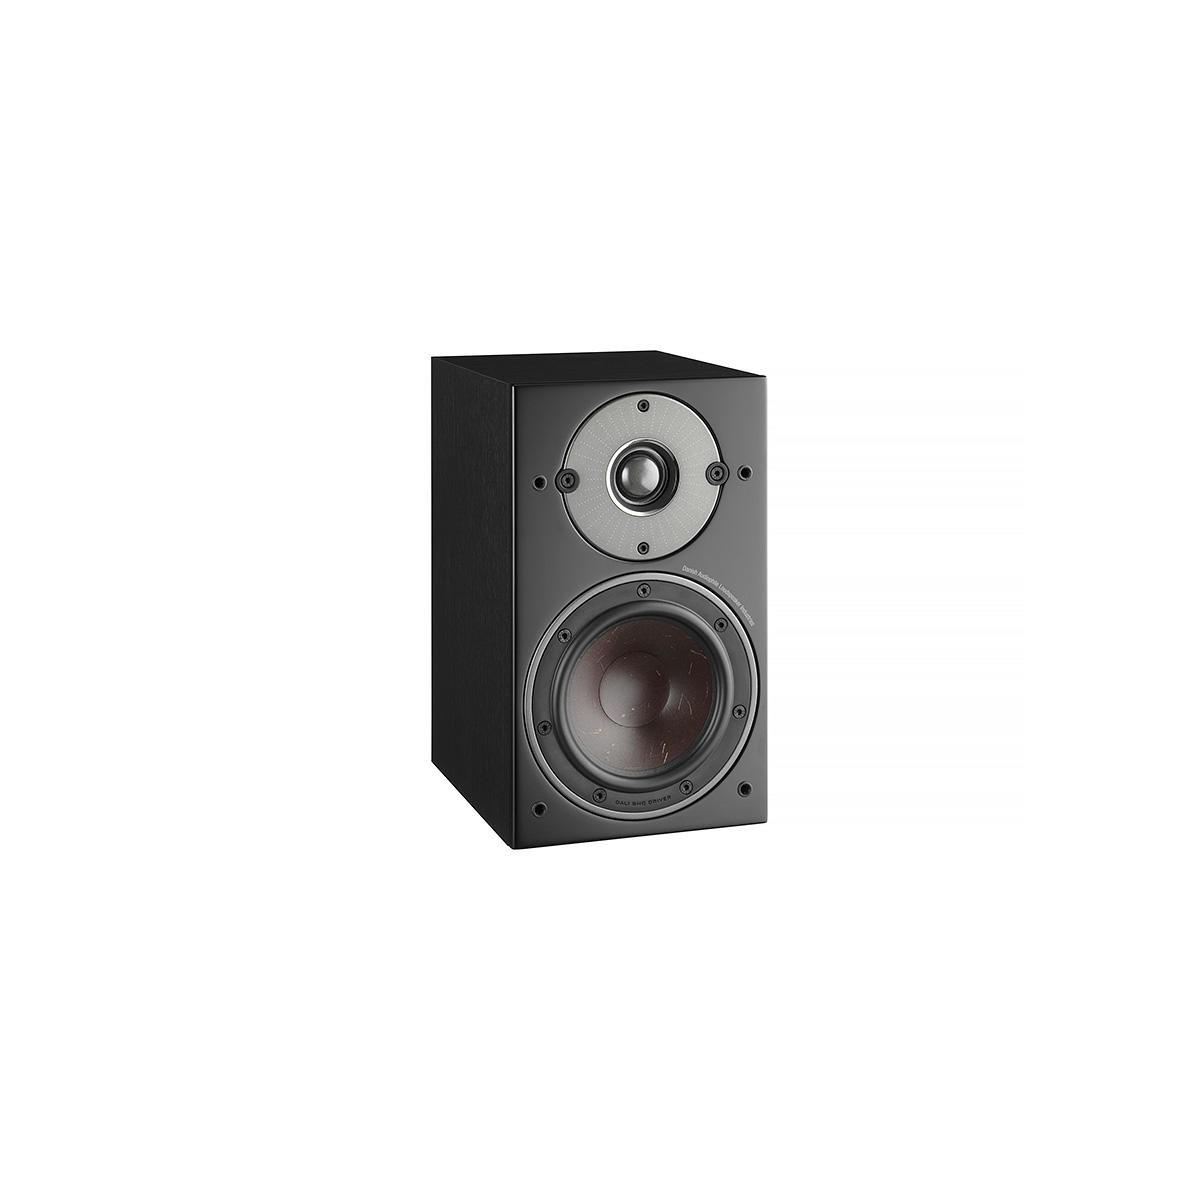 copy of Compact speaker OBERON 1 BLACK